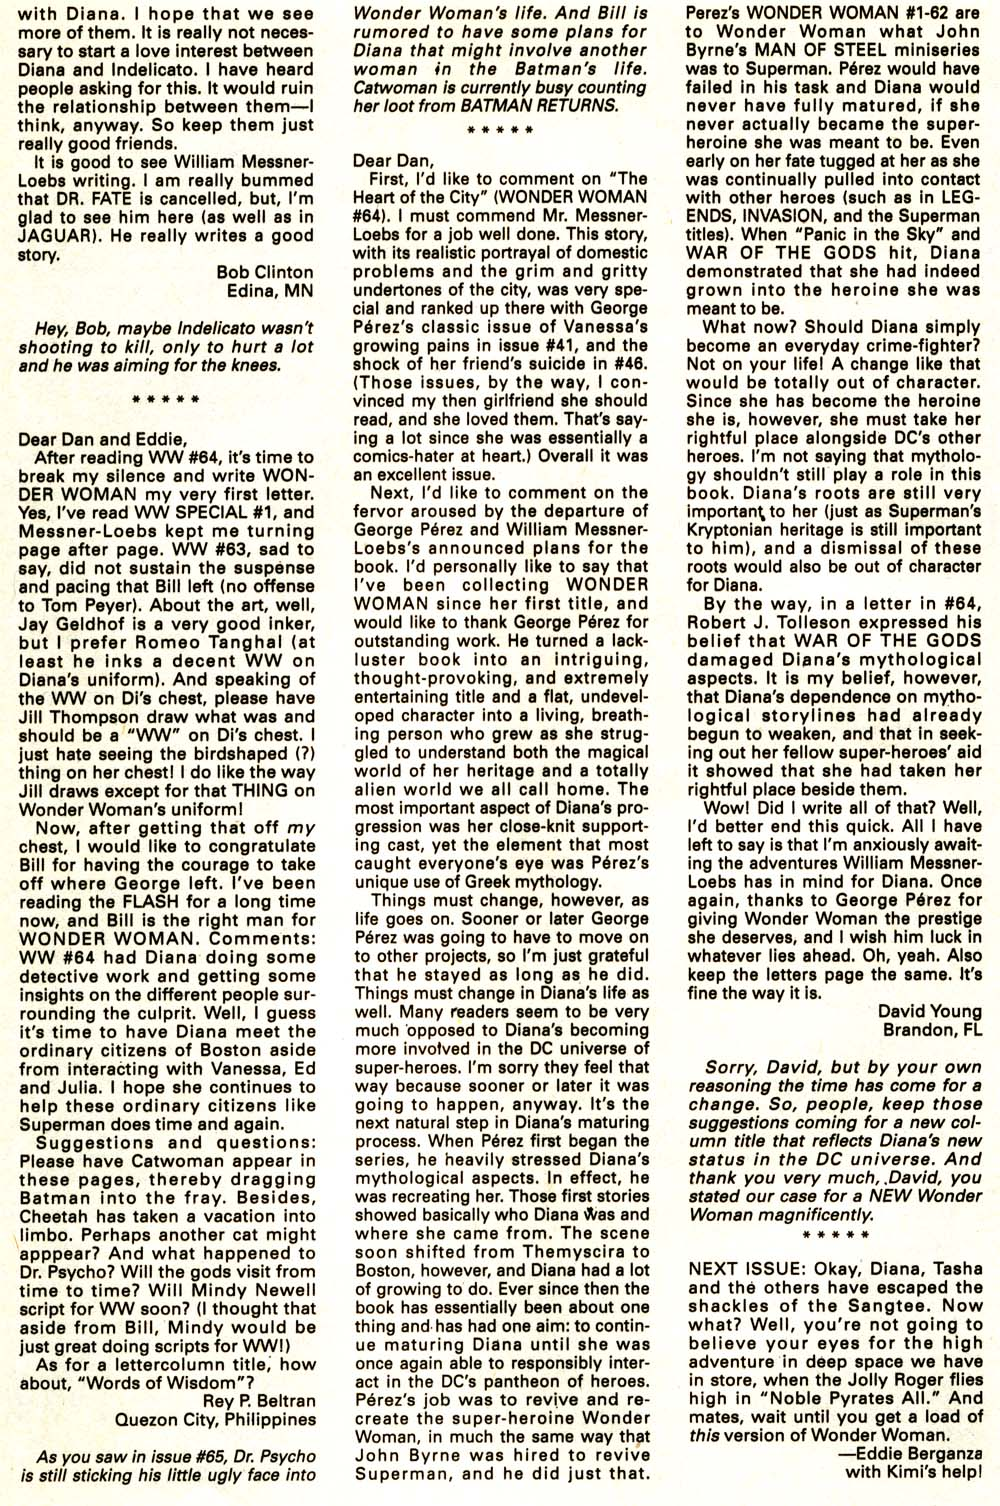 Read online Wonder Woman (1987) comic -  Issue #68 - 25